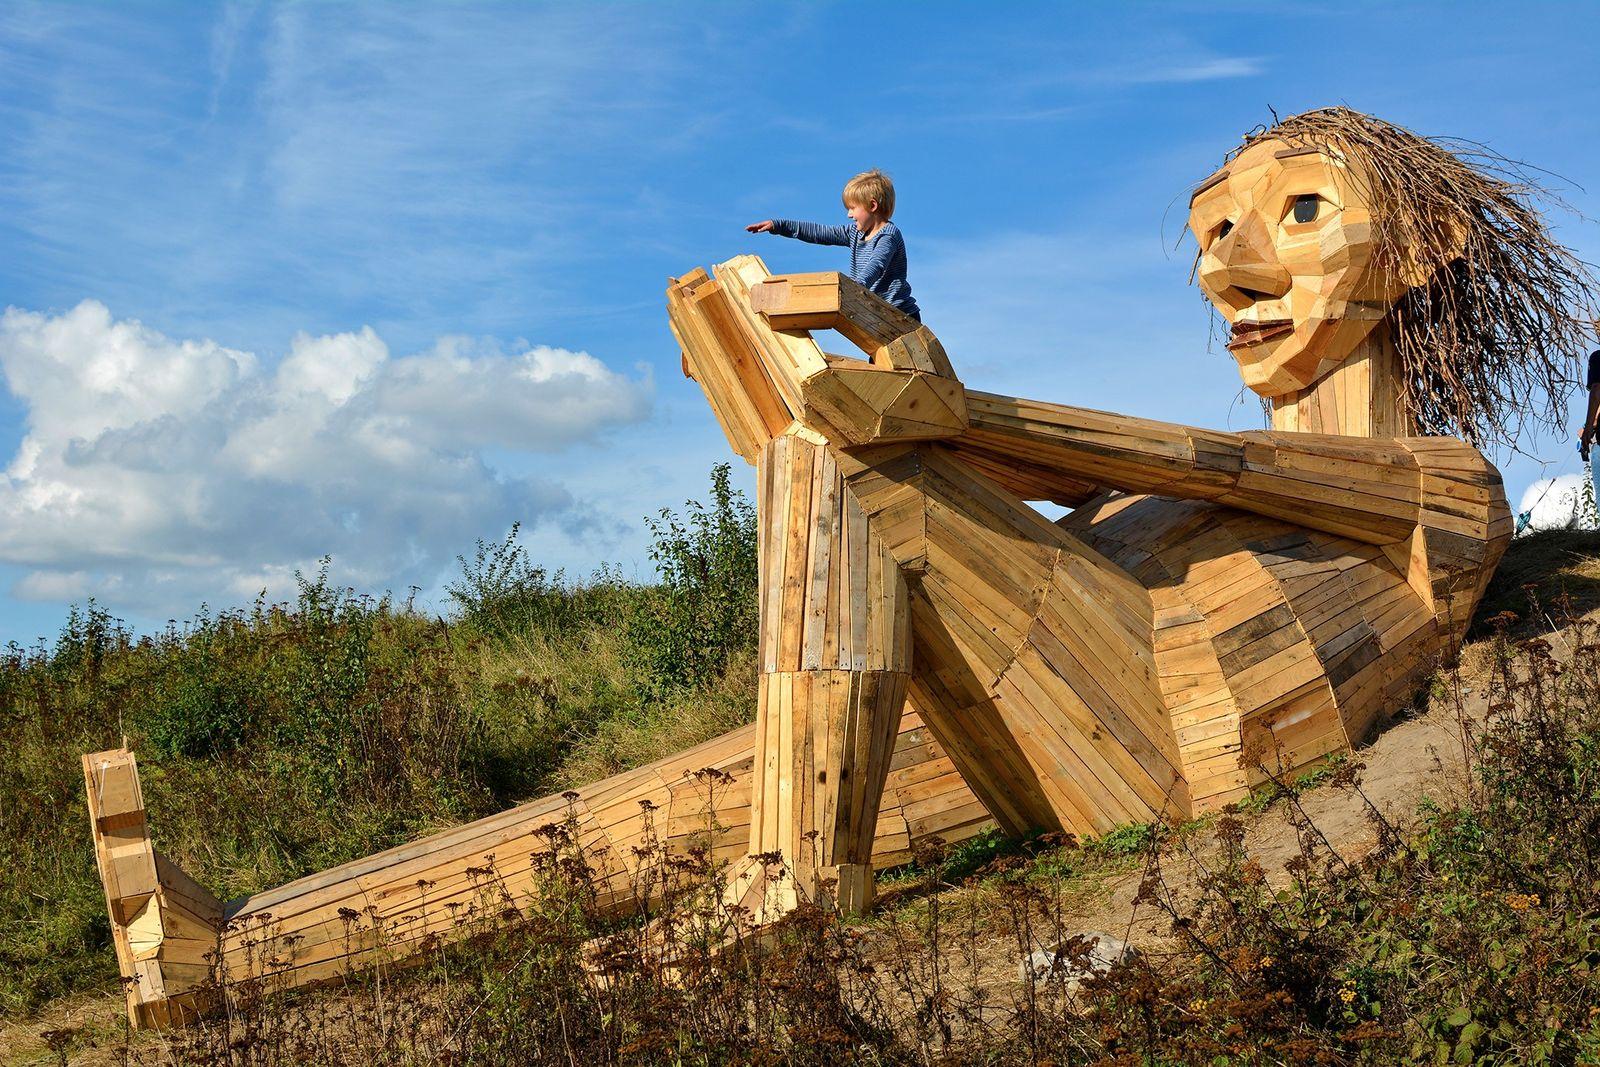 Trollskulptur des Künstlers Thomas Dambo